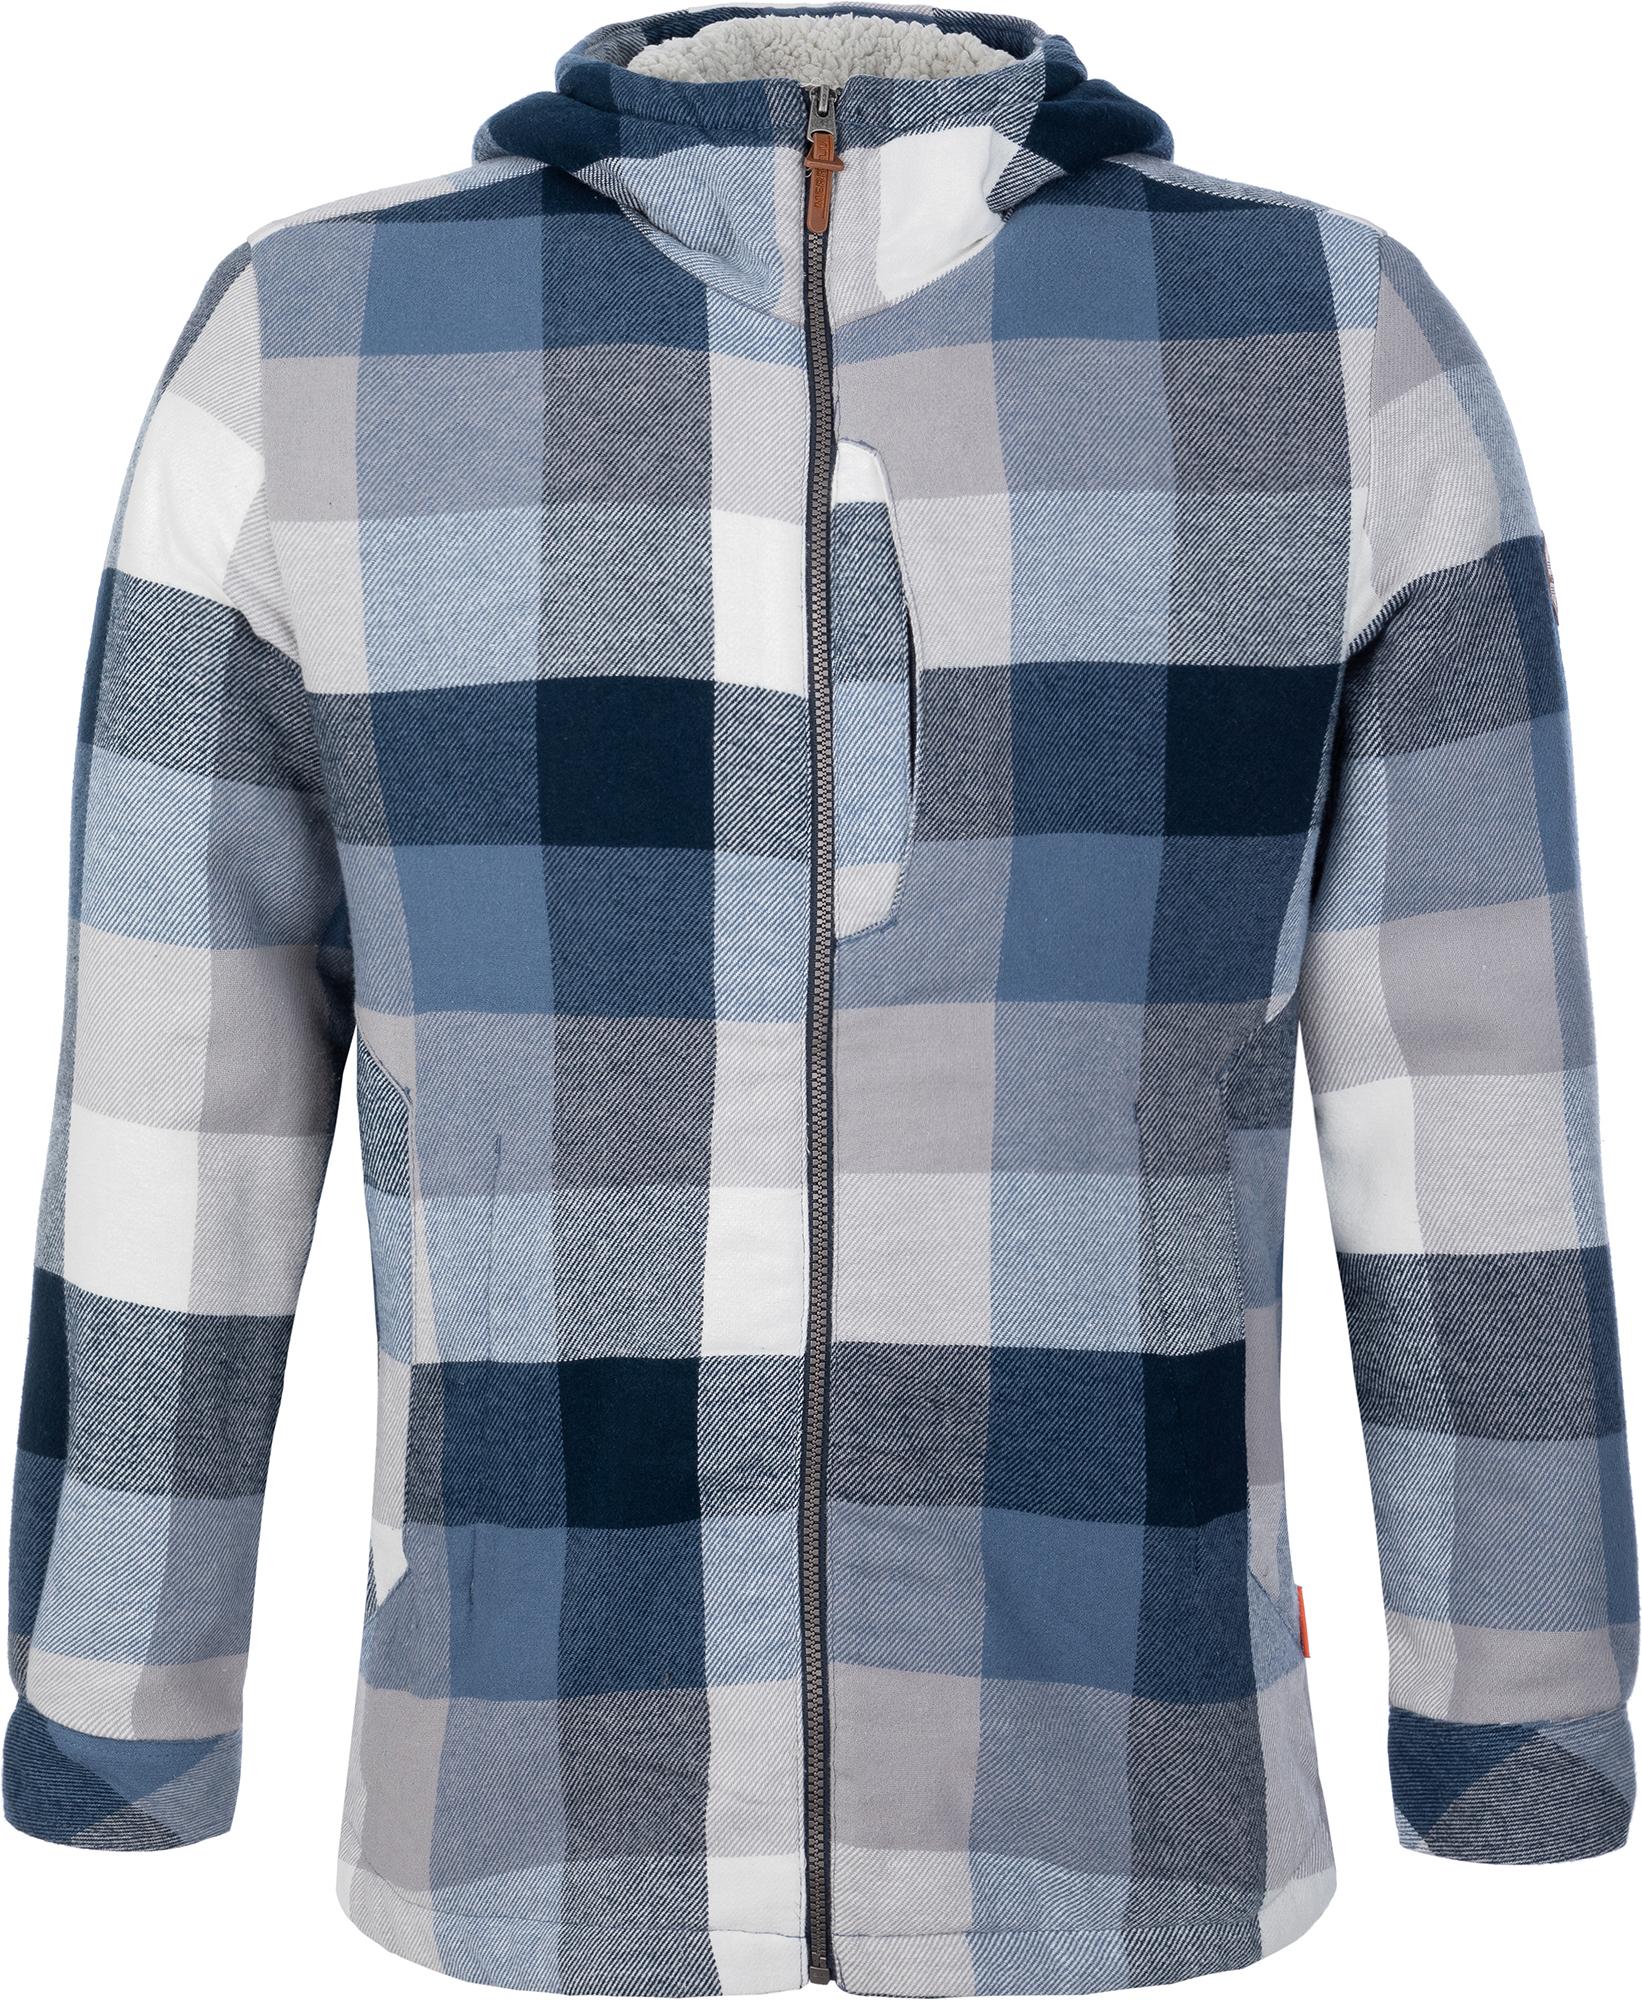 цена Merrell Рубашка мужская Merrell, размер 56 онлайн в 2017 году